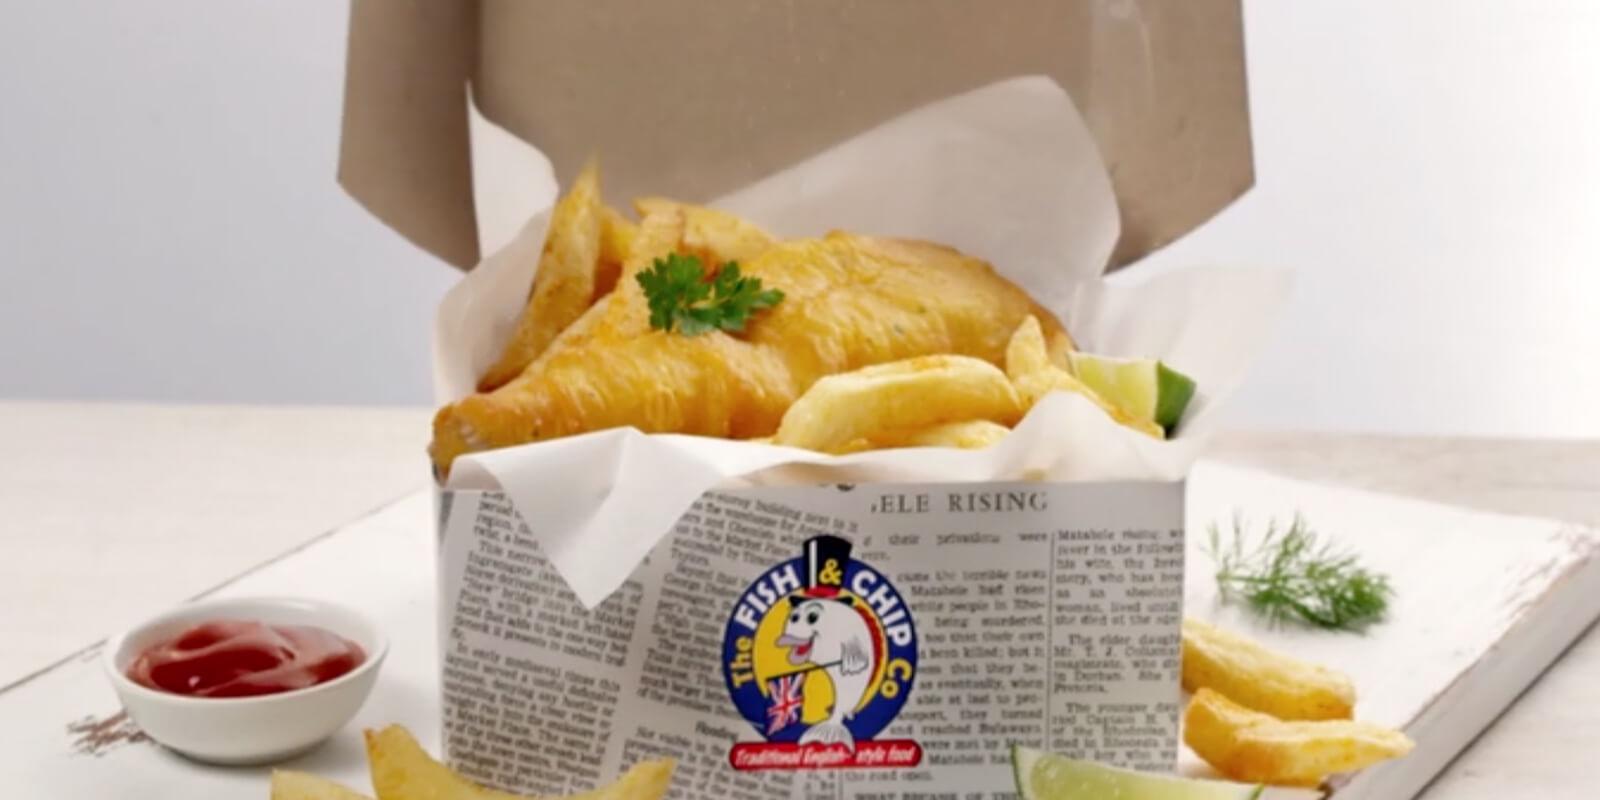 metropolitan republic fish n chips banned image 4